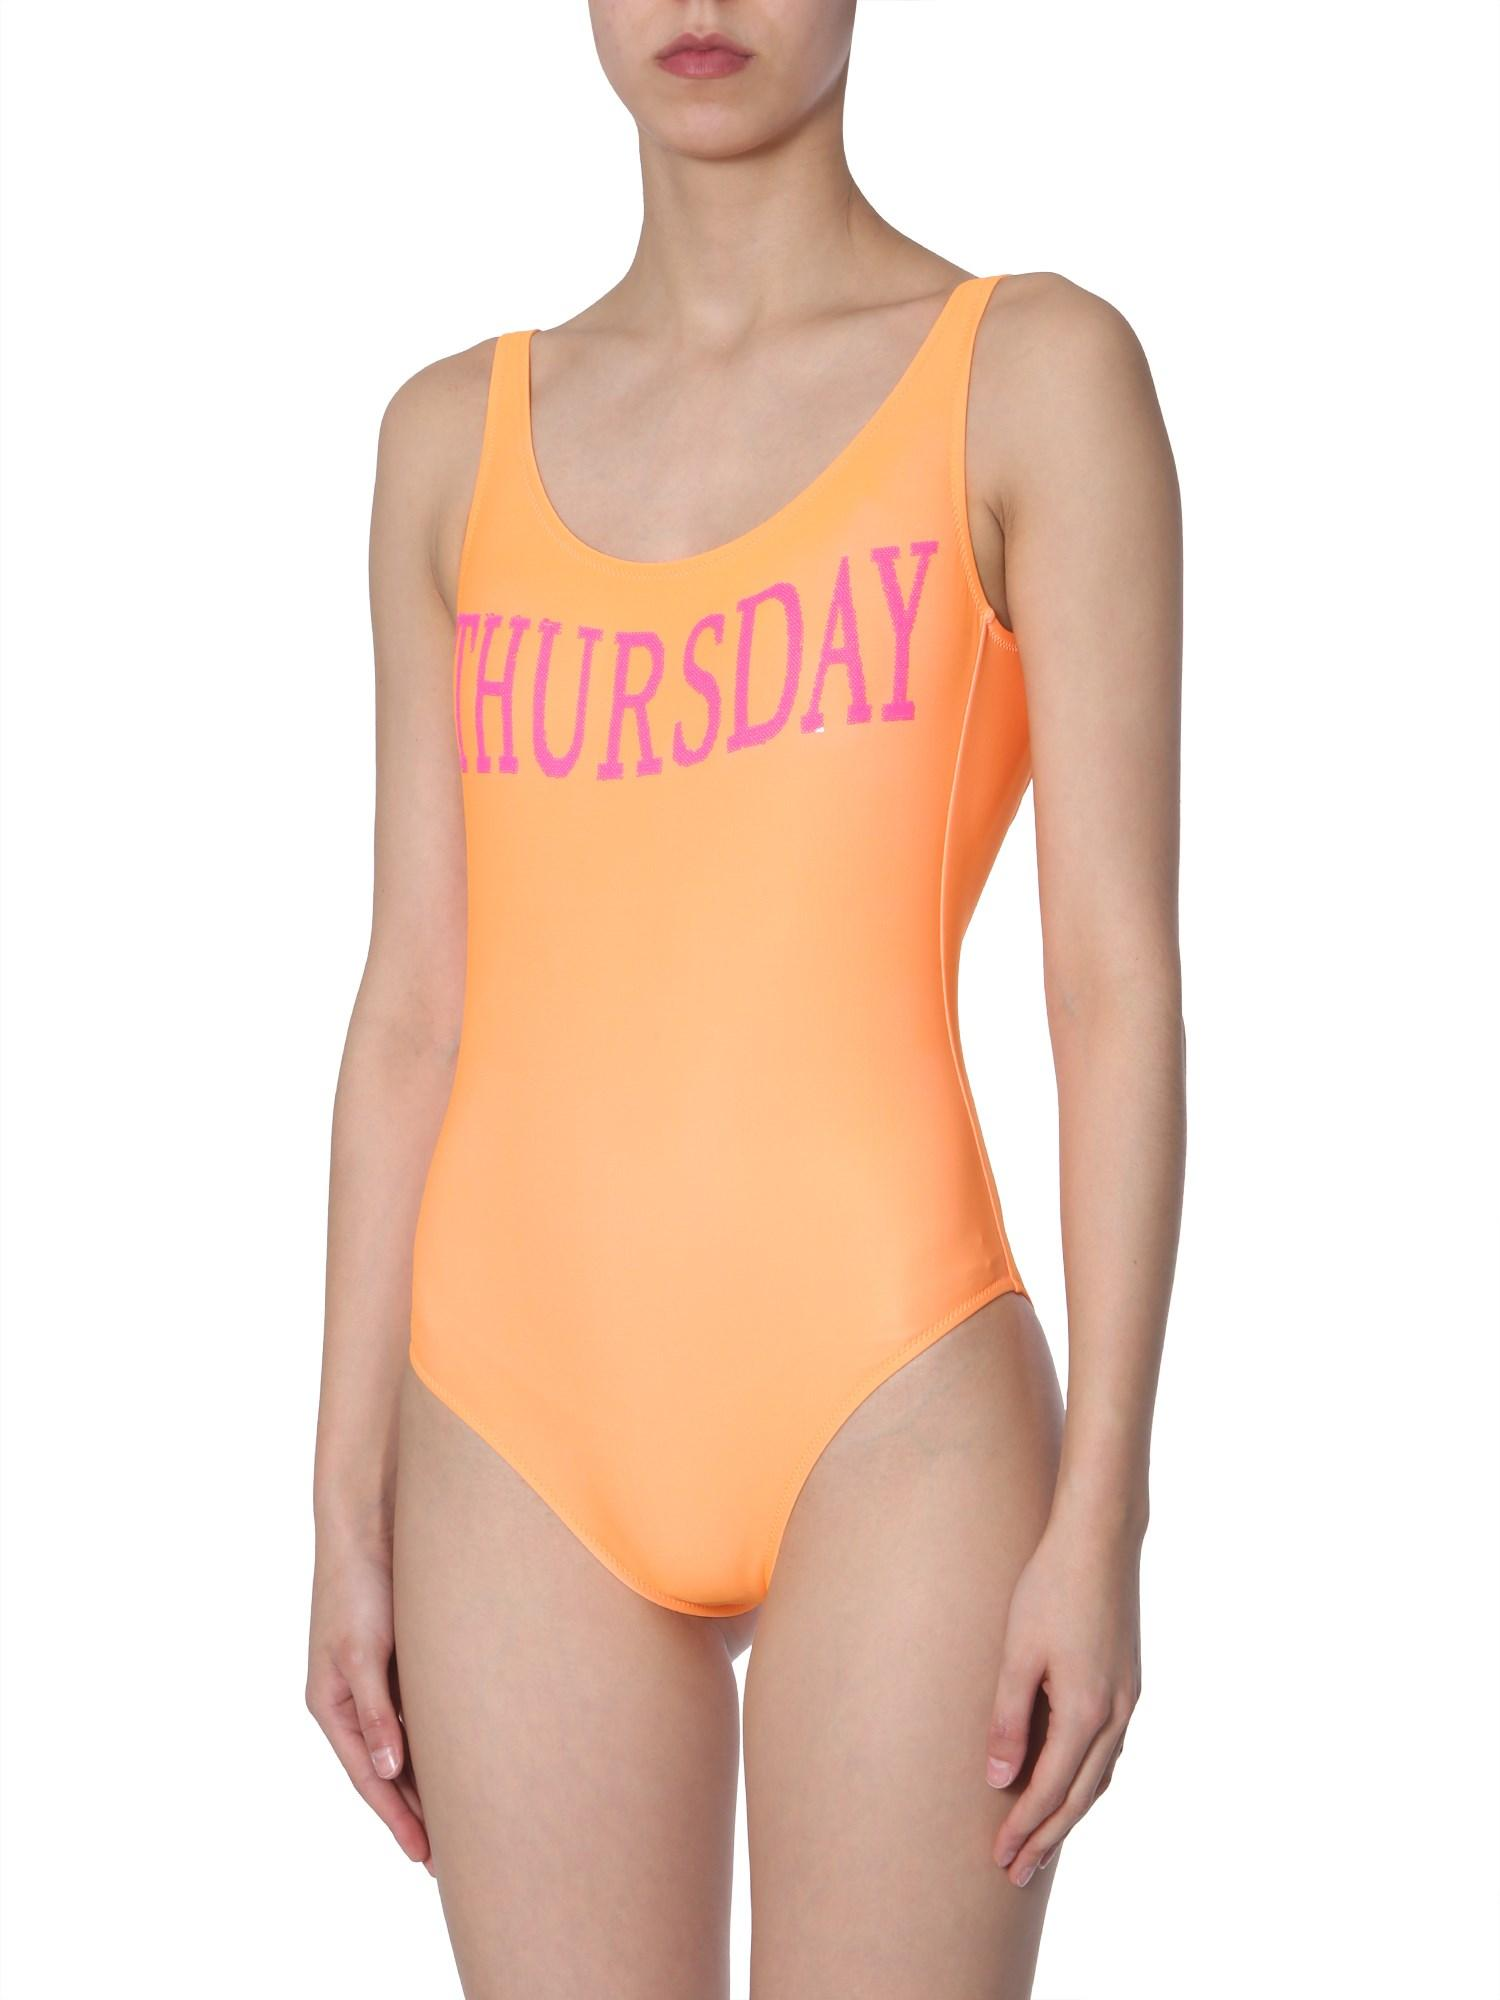 Thursday Lyst Costume Orange Ferretti Intero Alberta In lFJ1TKc